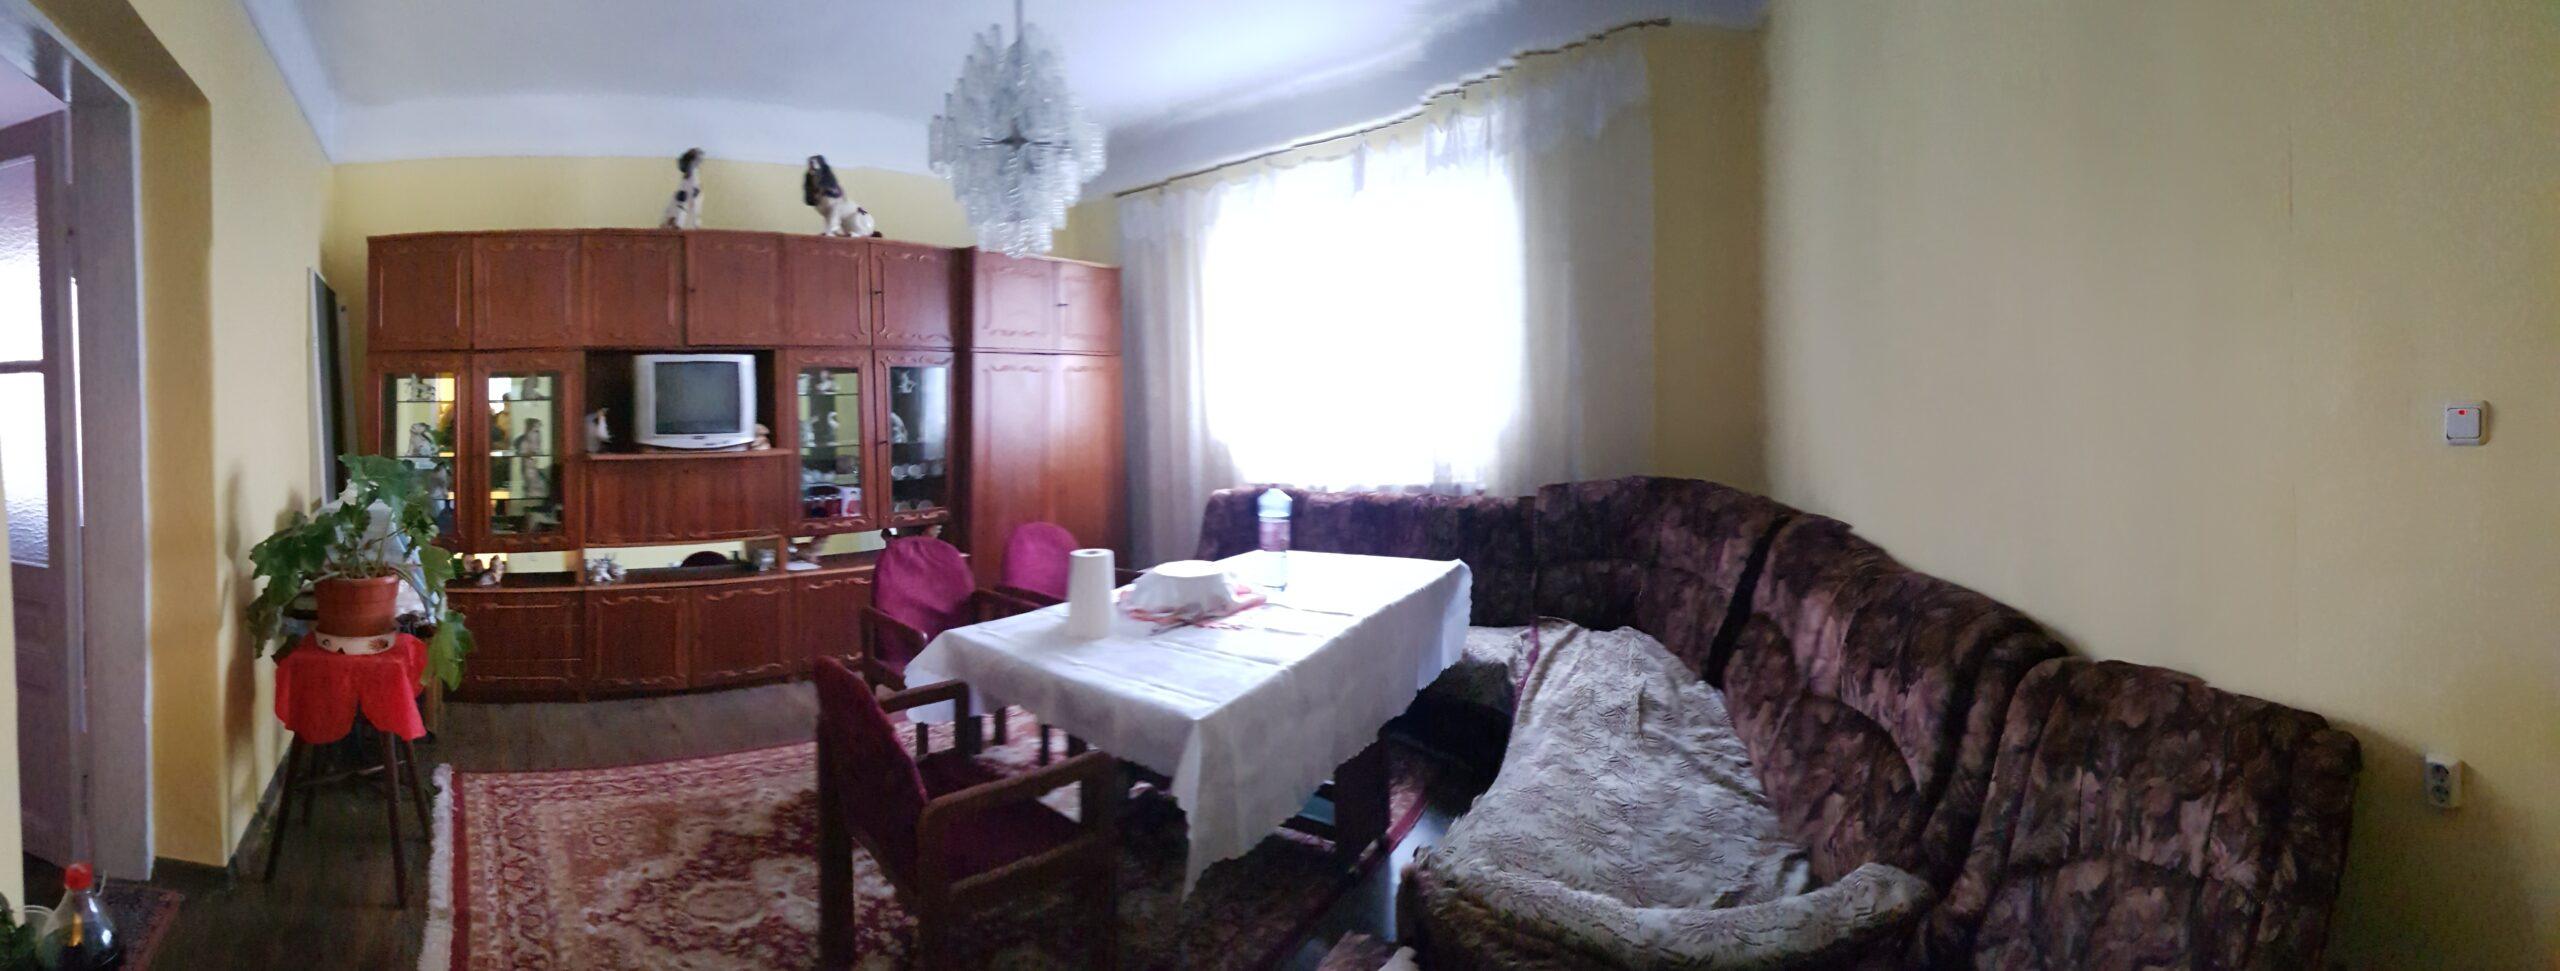 Vindem apartament cu 3 camere la casa,central din str Sucevei